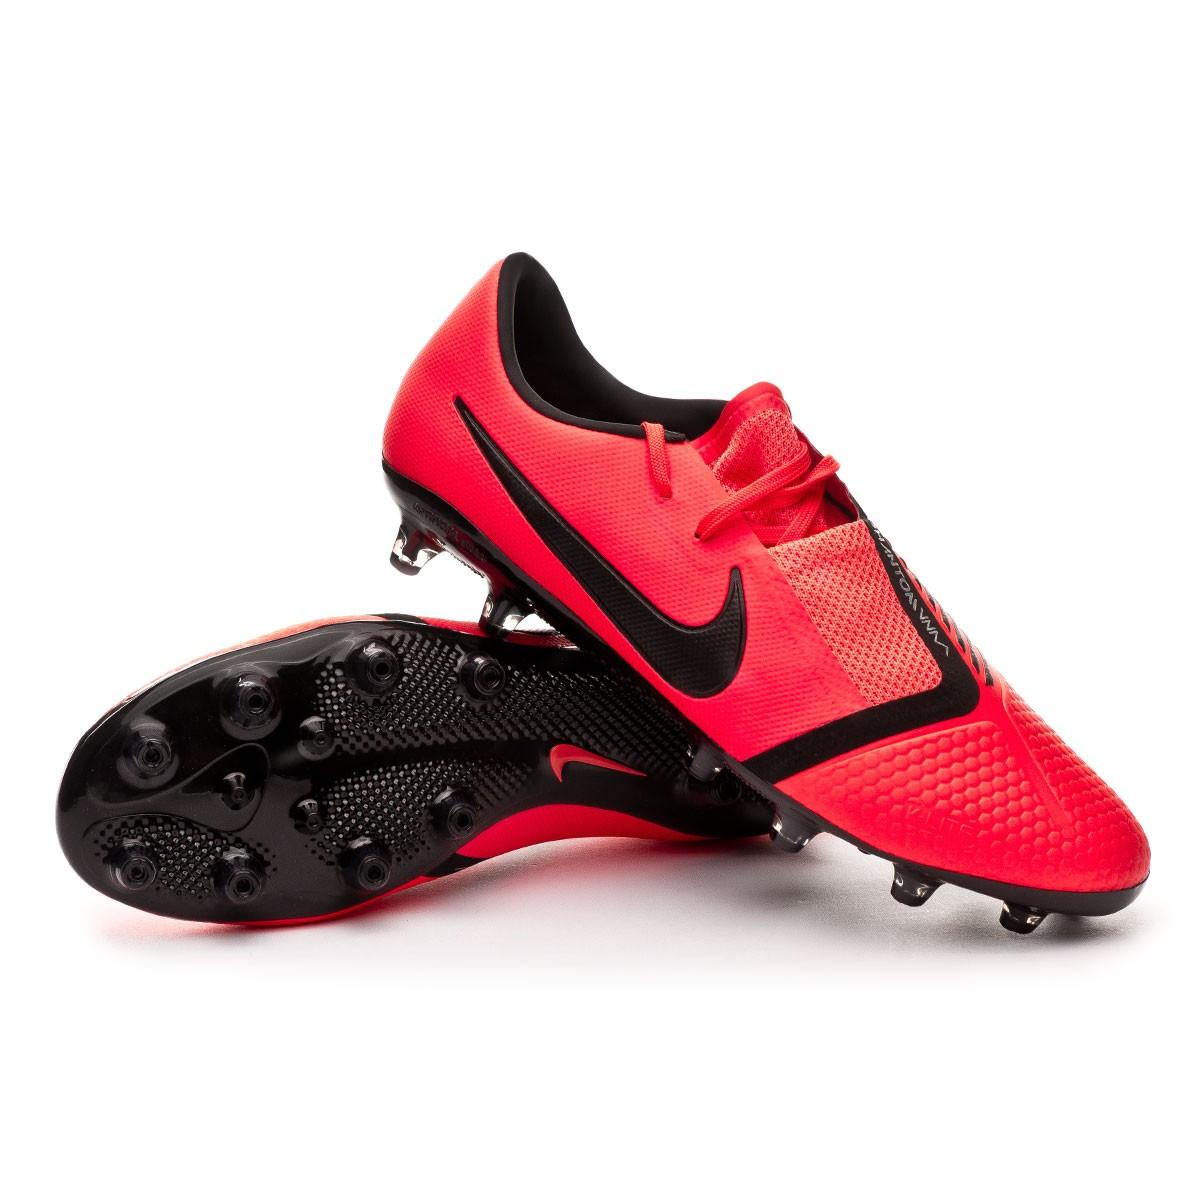 Honesto gusano suficiente  Football Boots Nike Phantom Venom Pro AG-Pro Bright crimson-Black -  Football store Fútbol Emotion